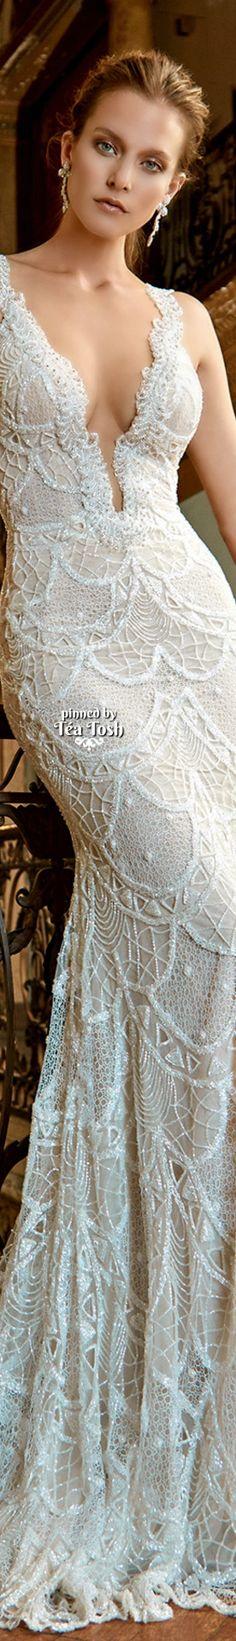 ❇Téa Tosh❇Galia Lahav 2017 Bridal Collection – Le Secret Royal II